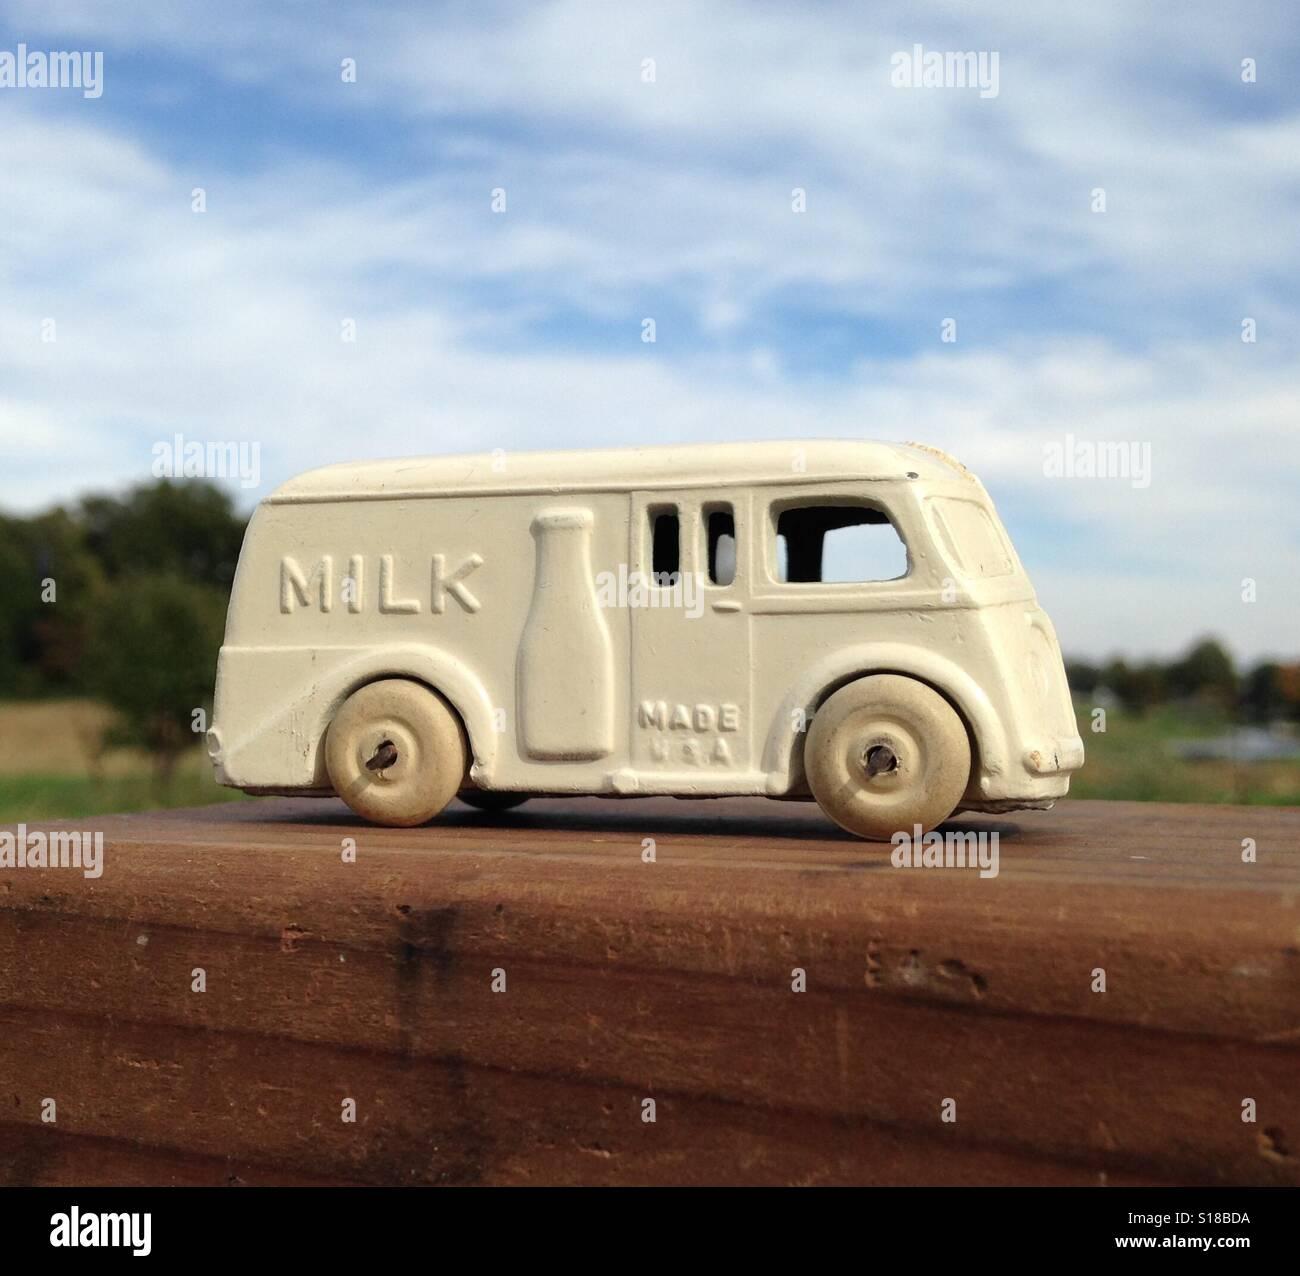 Vintage Toy Diecast Metal Milk Truck 1930s Stock Photo